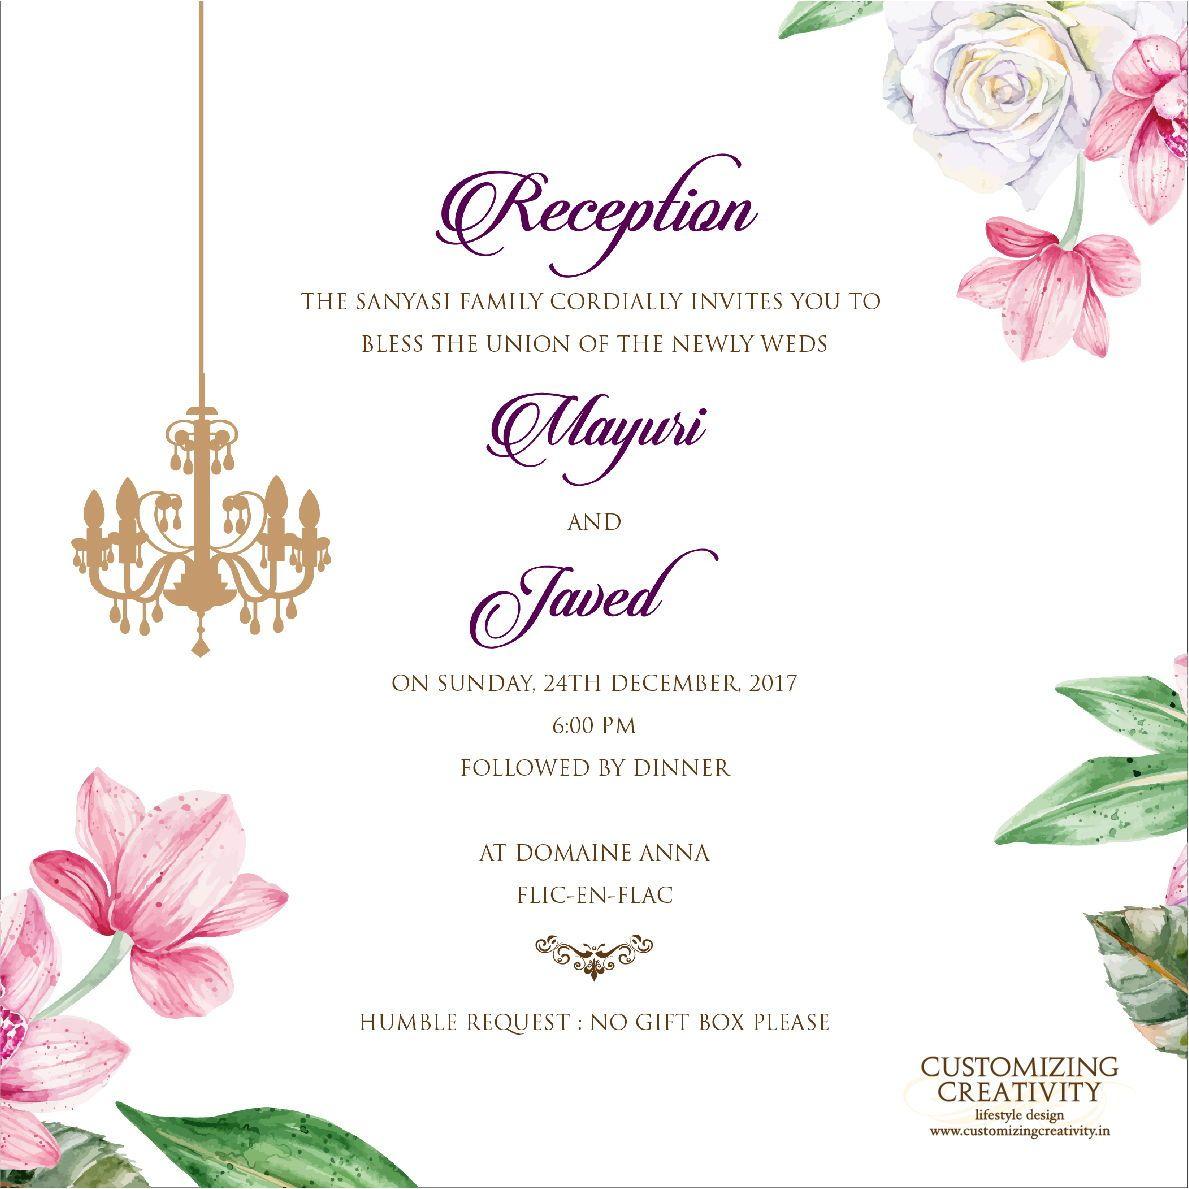 Wedding Invitation Cards Indian Wedding Cards Invites Wedding Stationery E Invite E Invitation Wedding Cards Indian Wedding Cards Wedding Invitation Cards